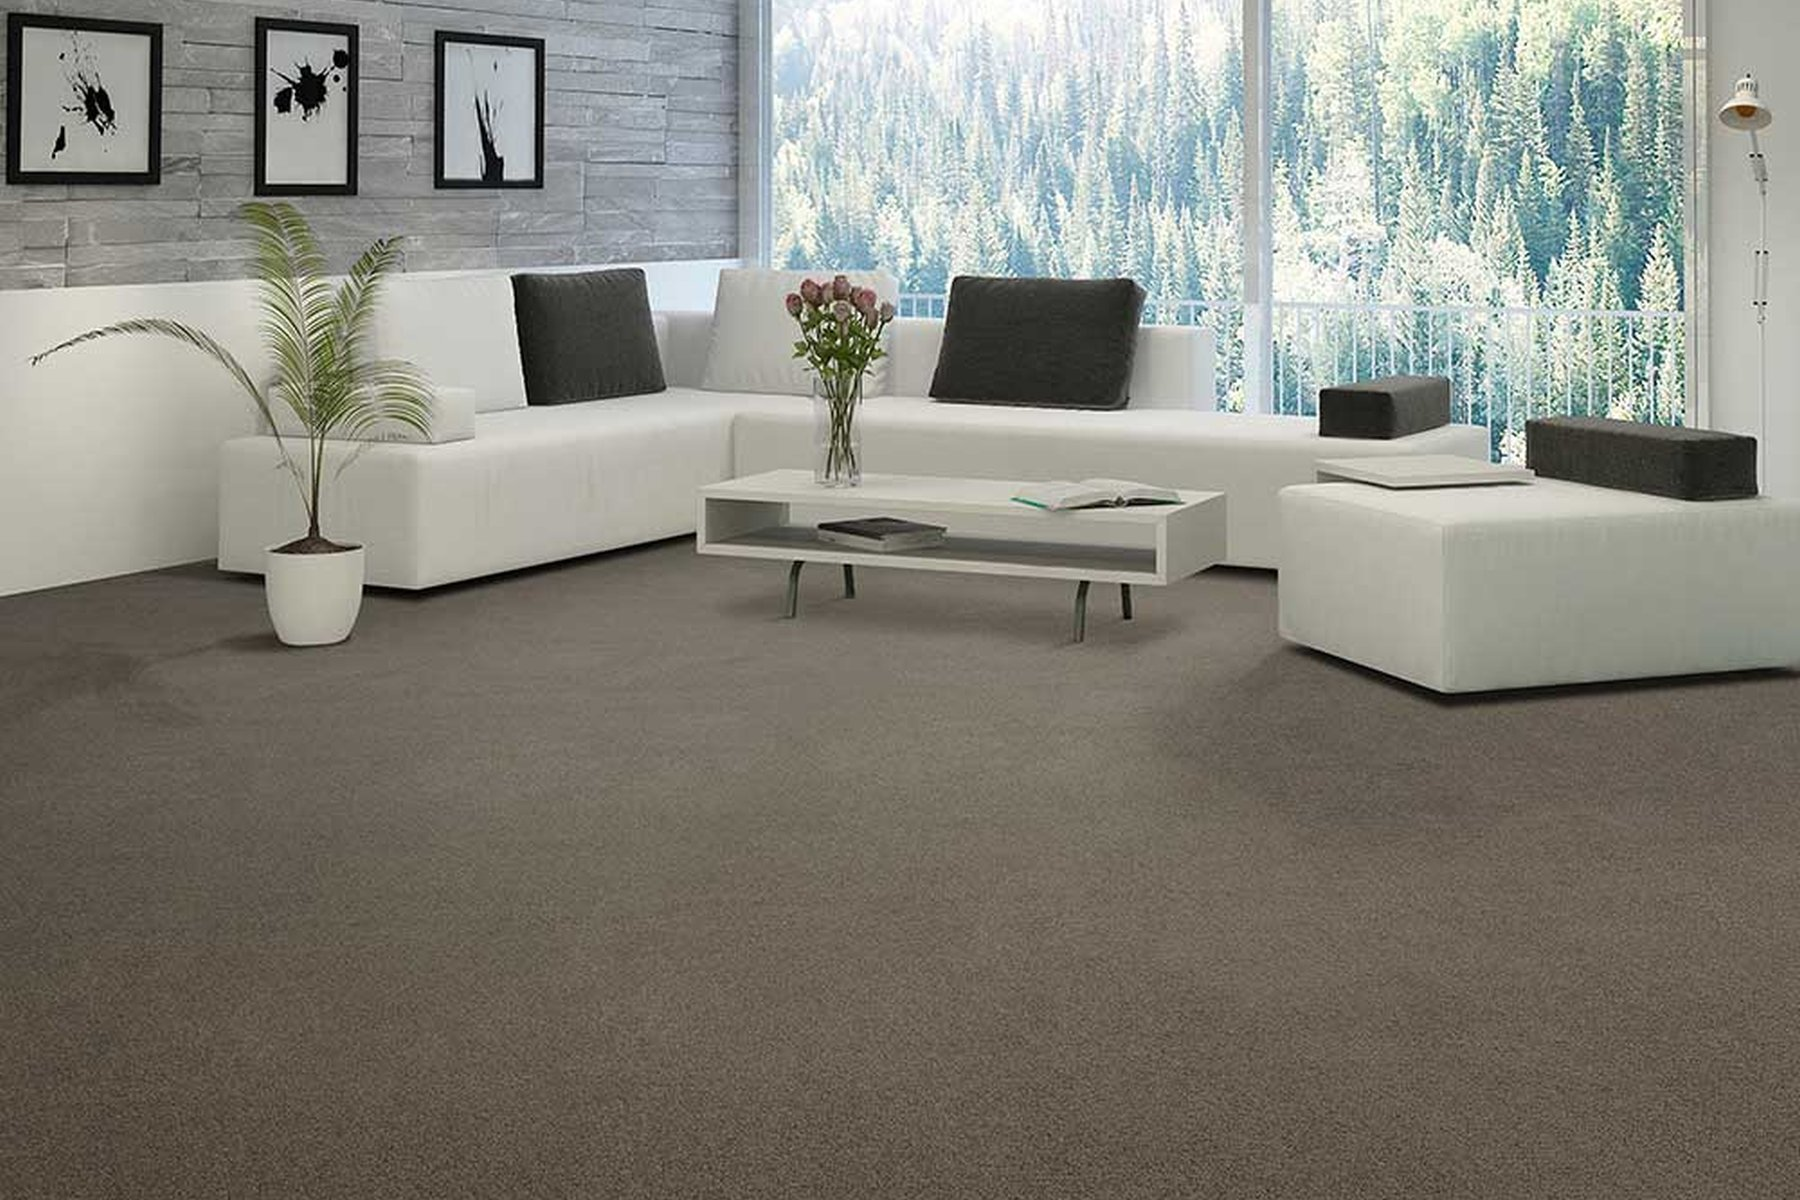 Belakos tapijt den haag